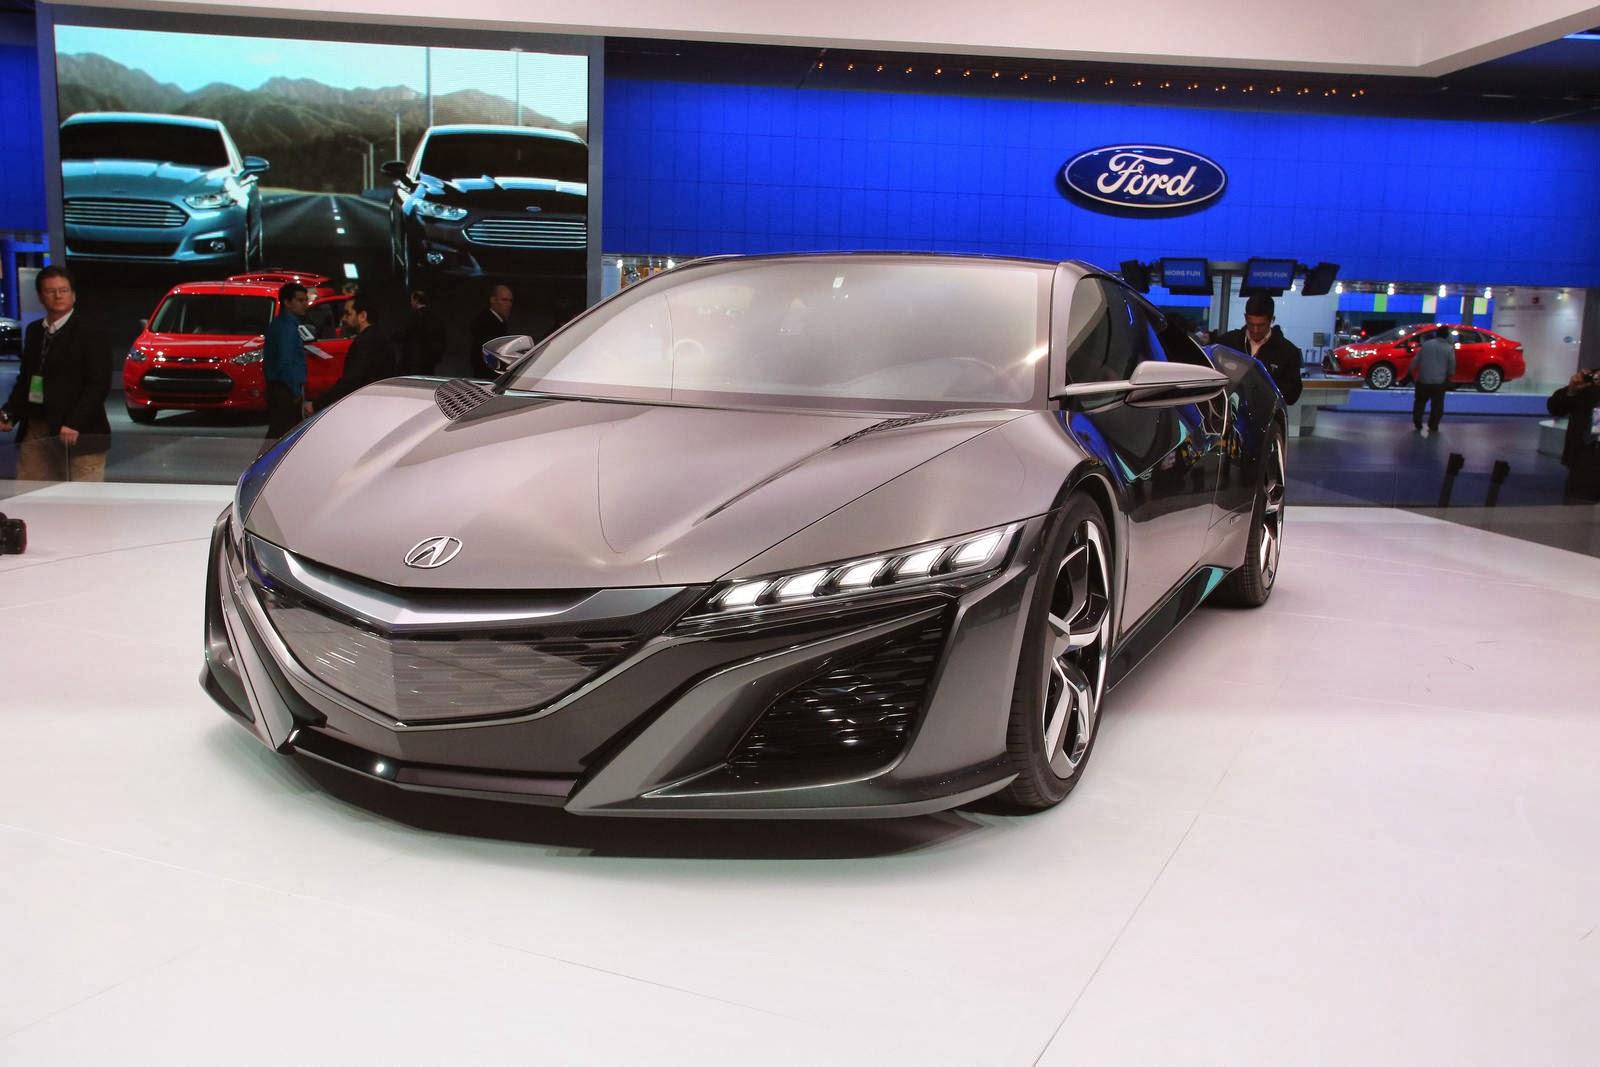 cars under 30k 2014 sports cars under 40k 2014 sports cars under